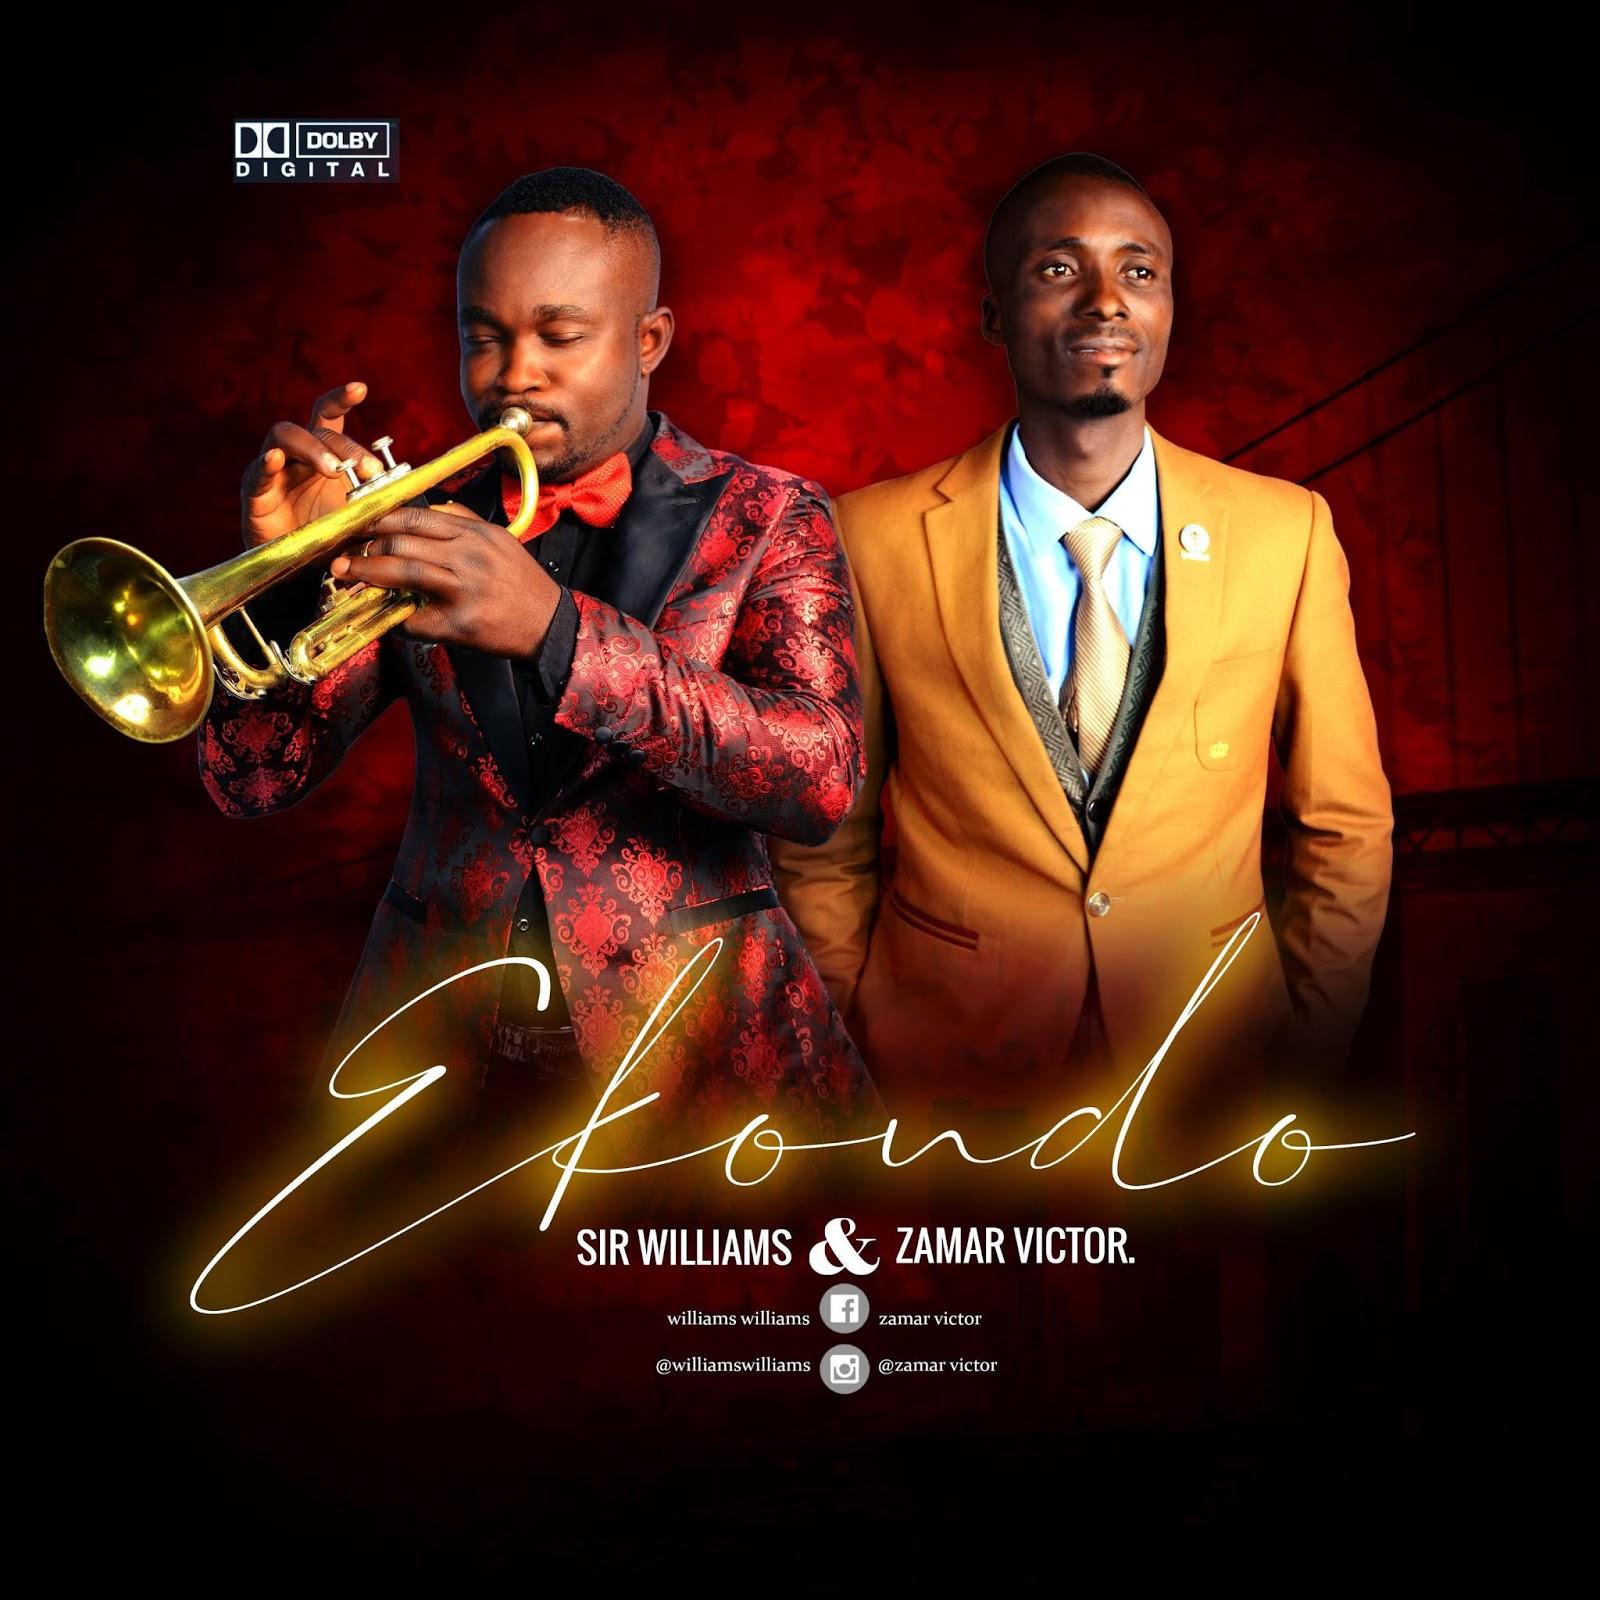 Sir Williams & Zamar Victor - Ekondo Mp3 Download